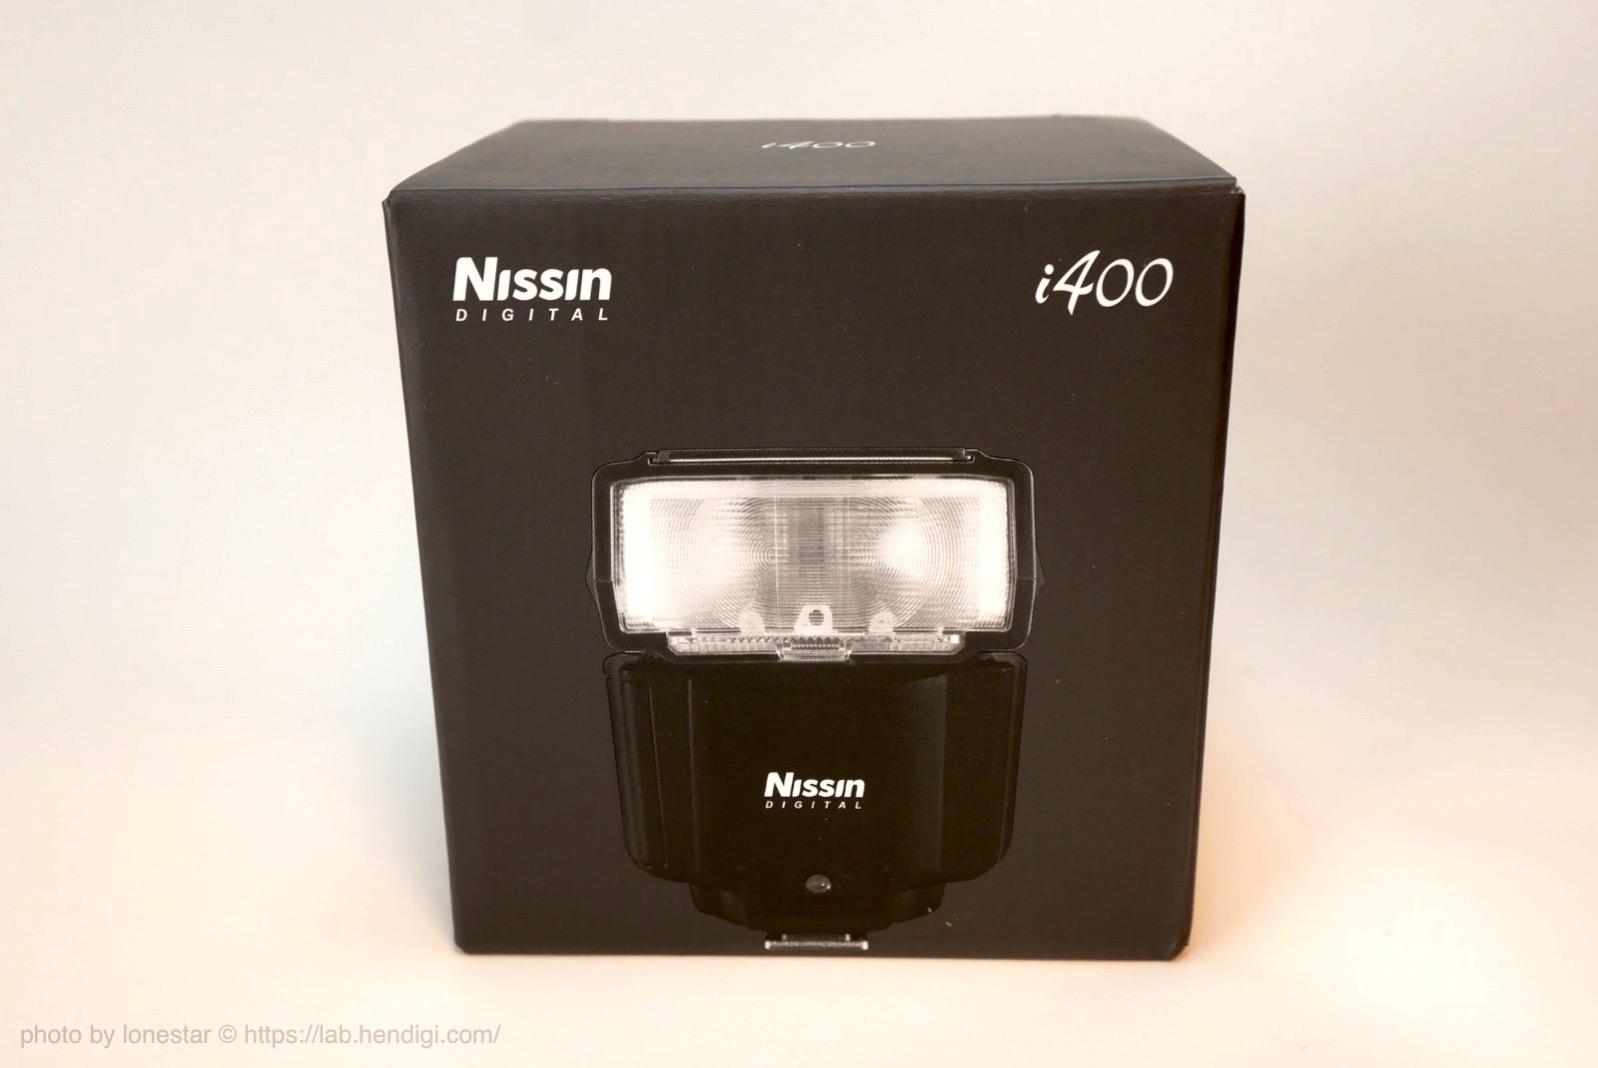 Nissin i400